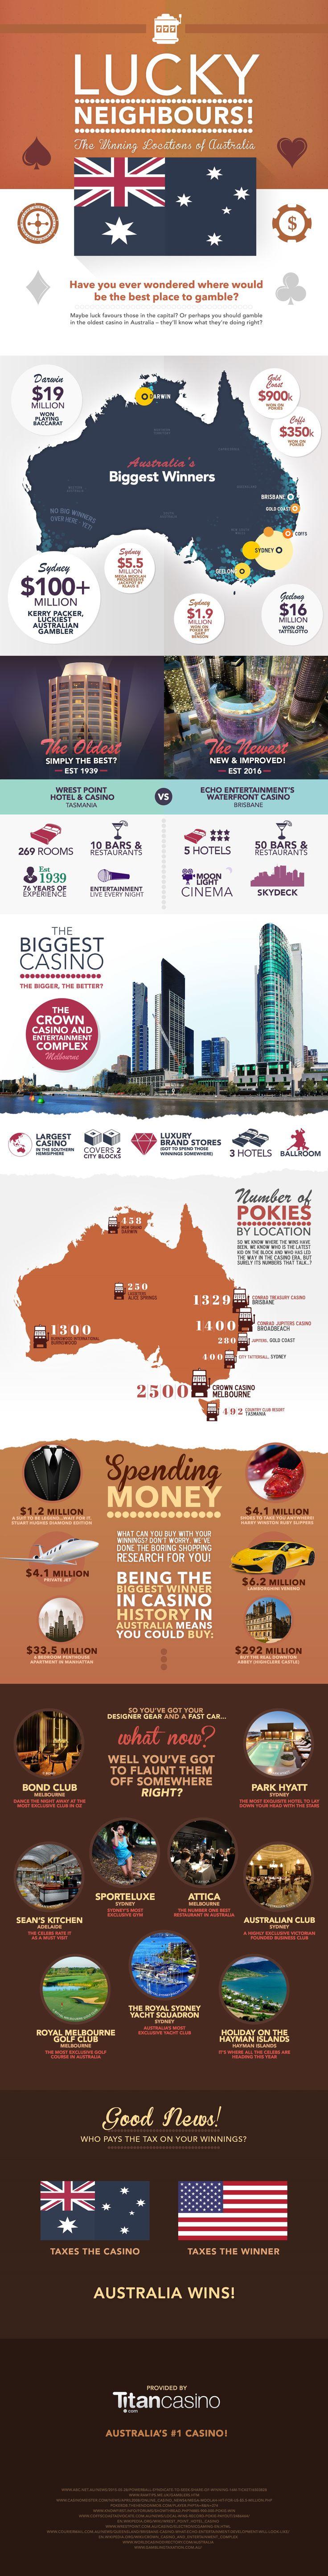 Casino Tourism in Australia: Where to Find Australia's Best Casino's